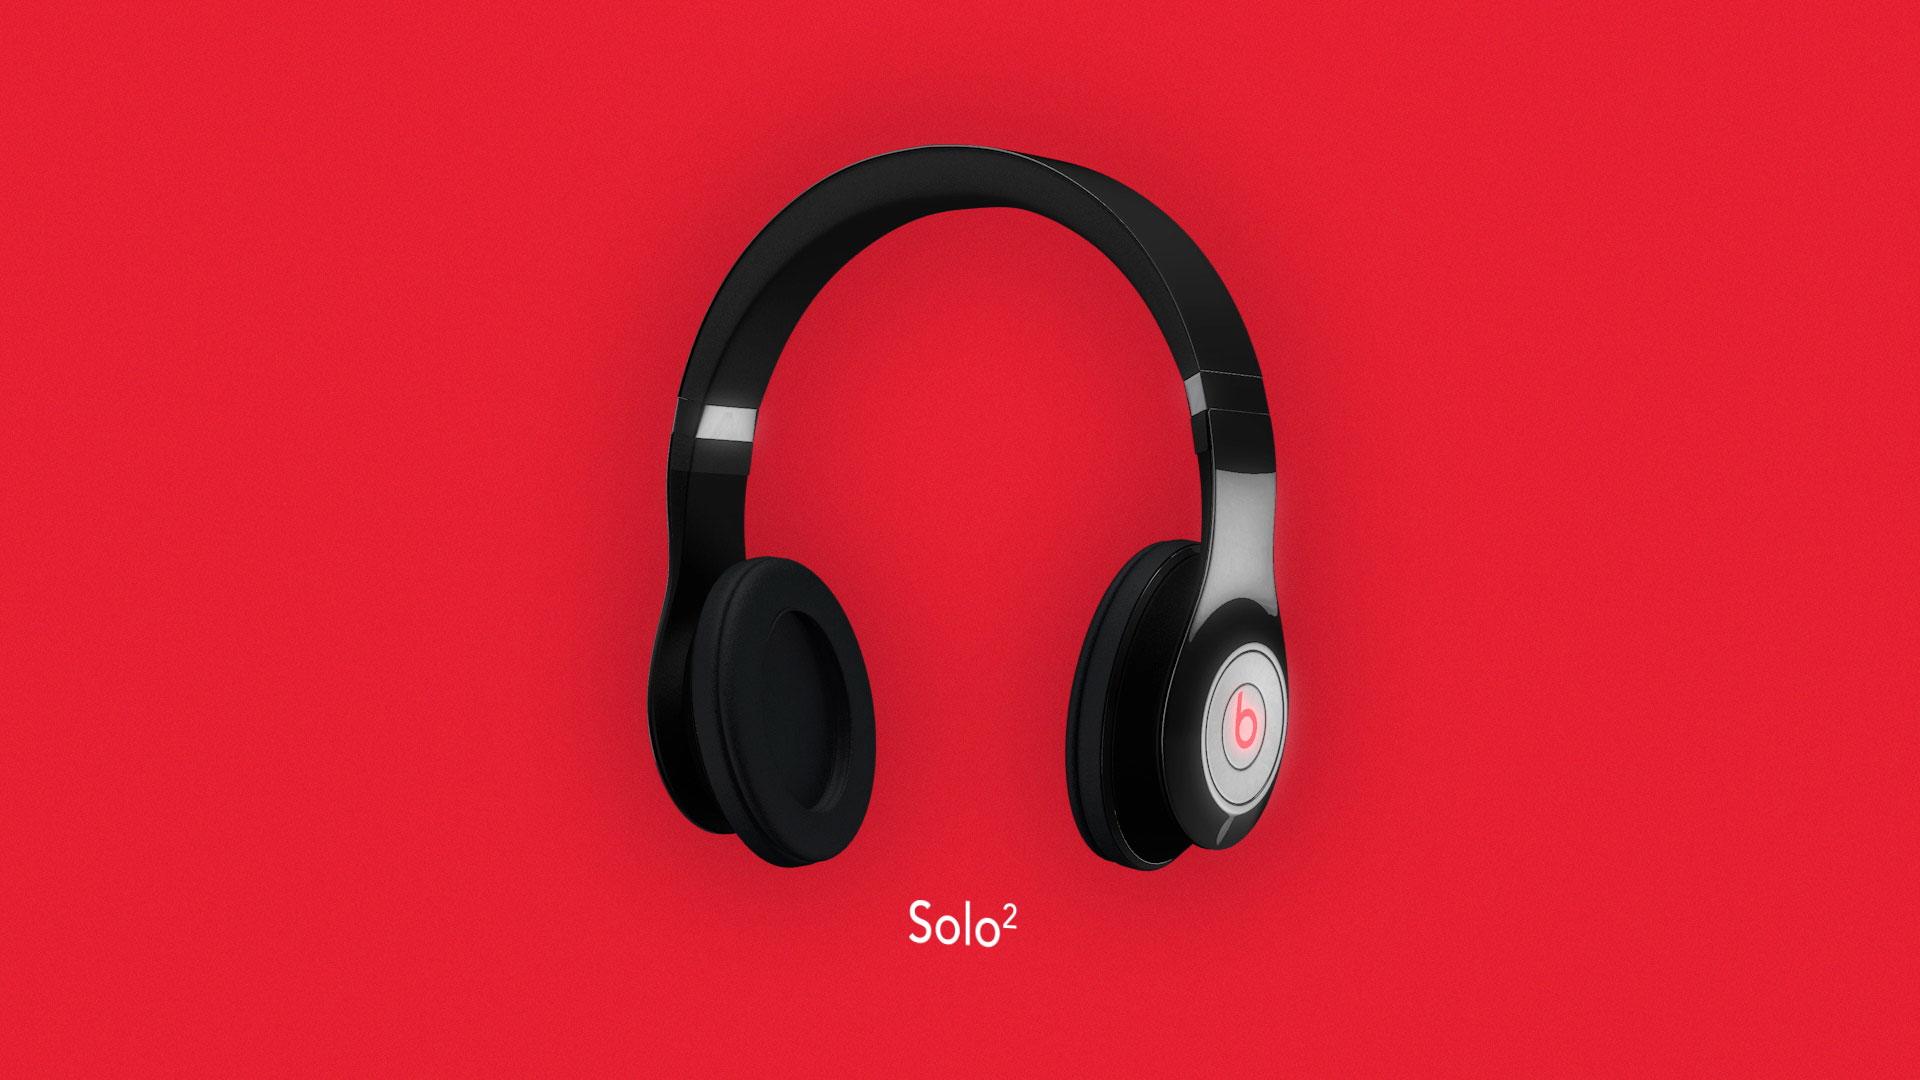 Beats Solo